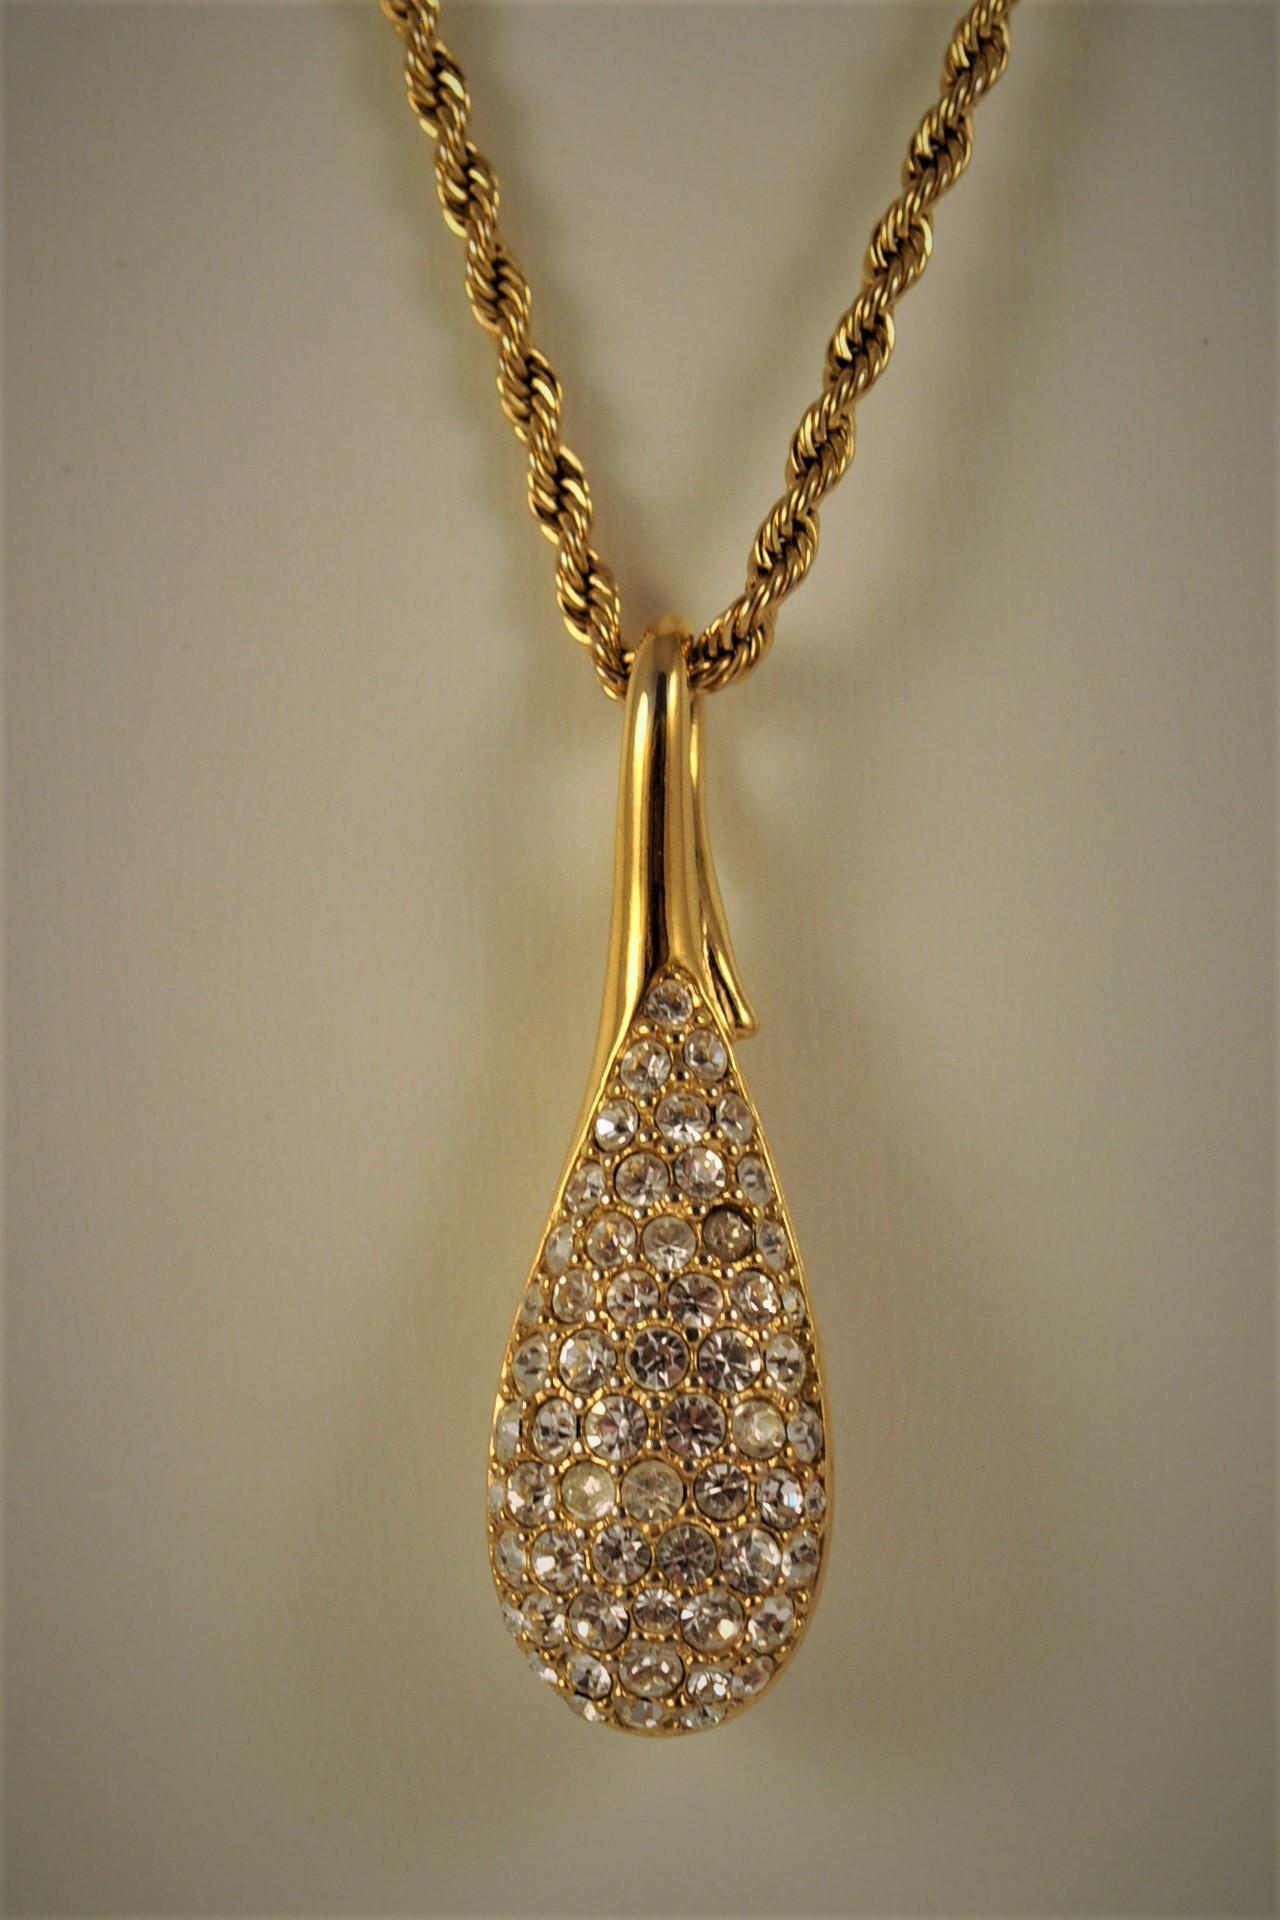 Vintage Swarovski Large Crystal Teardrop Pendant Amp Long